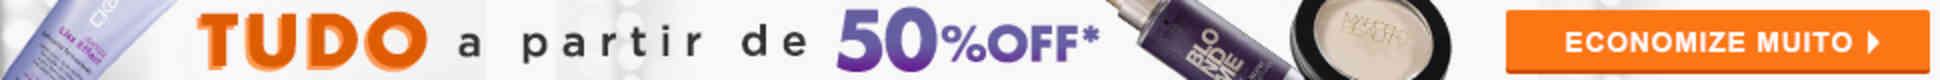 Tudo a partir de 50%off